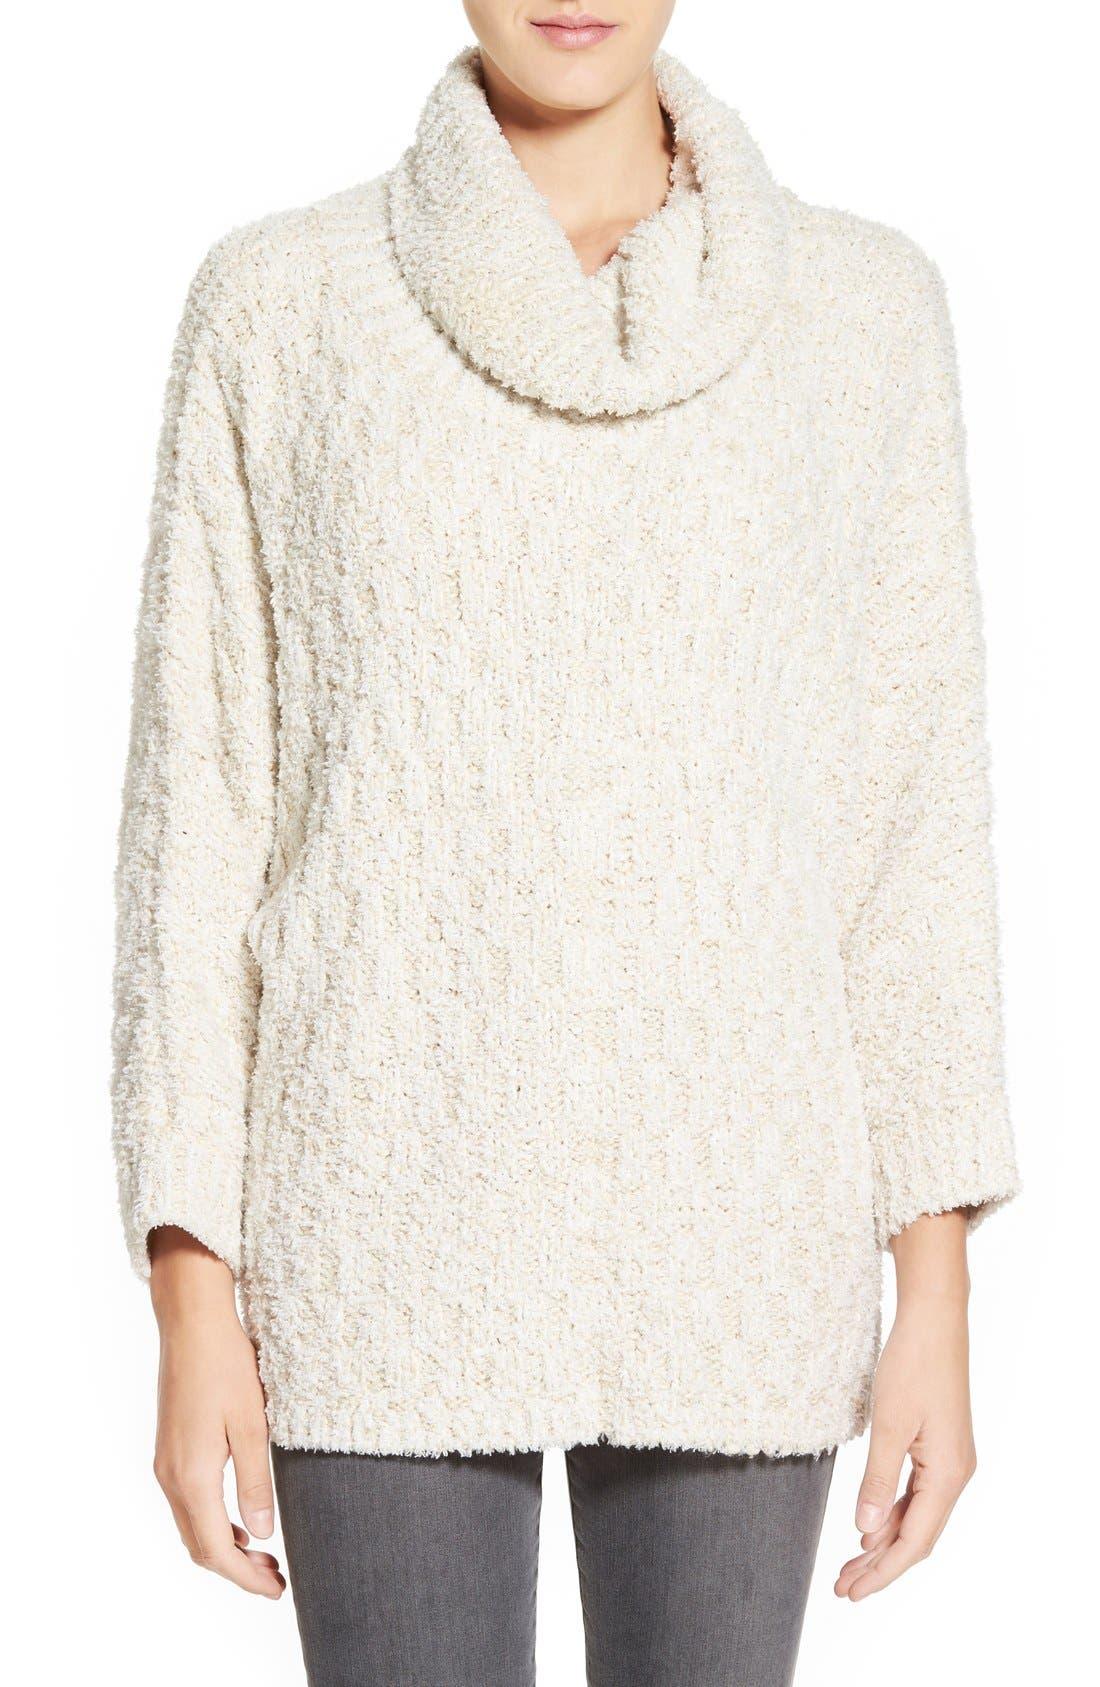 Alternate Image 1 Selected - Chelsea28 Fluffy Turtleneck Sweater